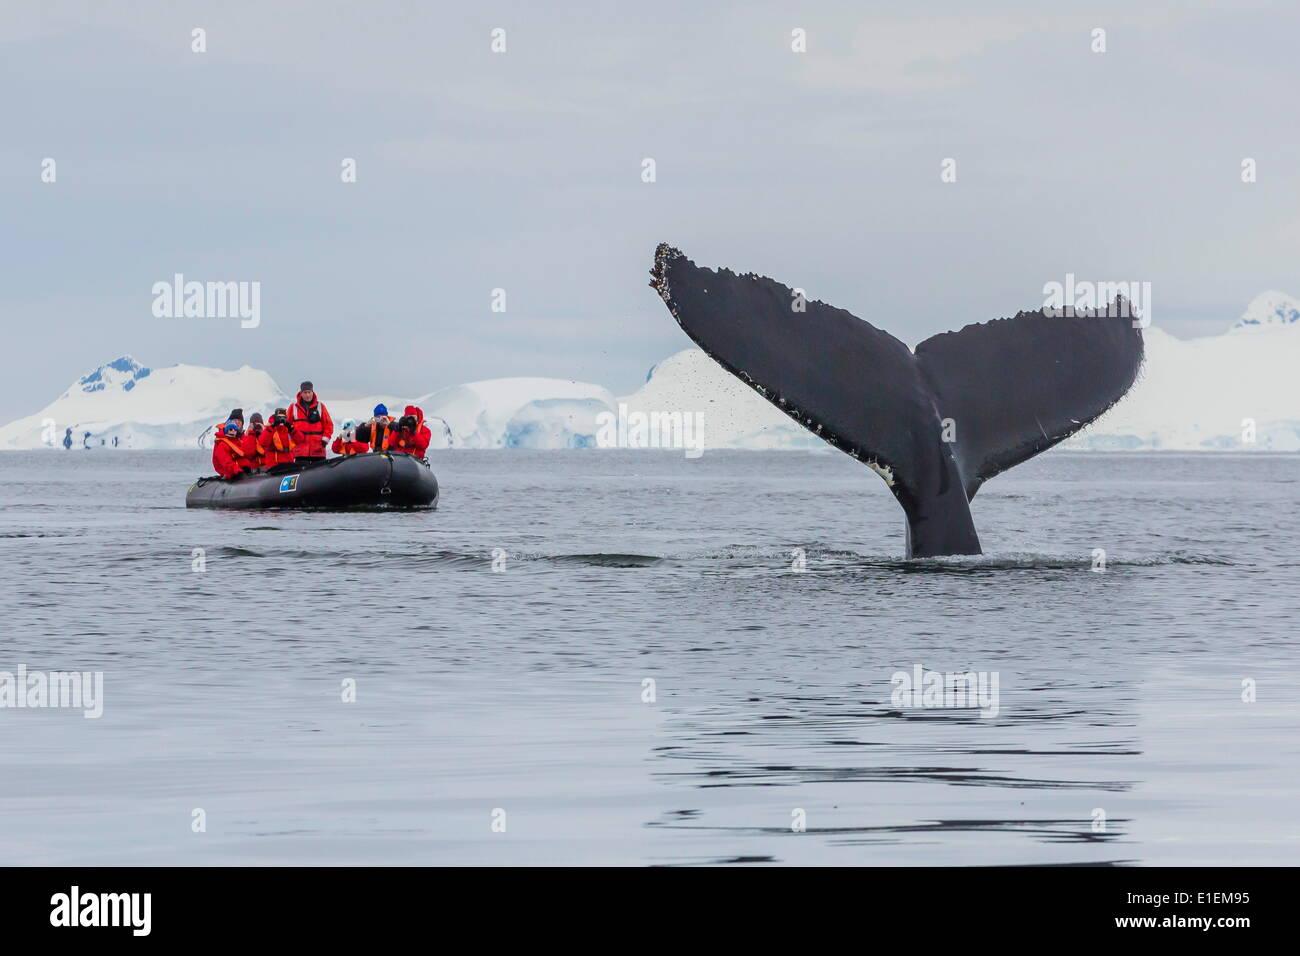 Humpback whale (Megaptera novaeangliae), flukes-up dive near whale watchers in the Enterprise Islands, Antarctica, Polar Regions - Stock Image